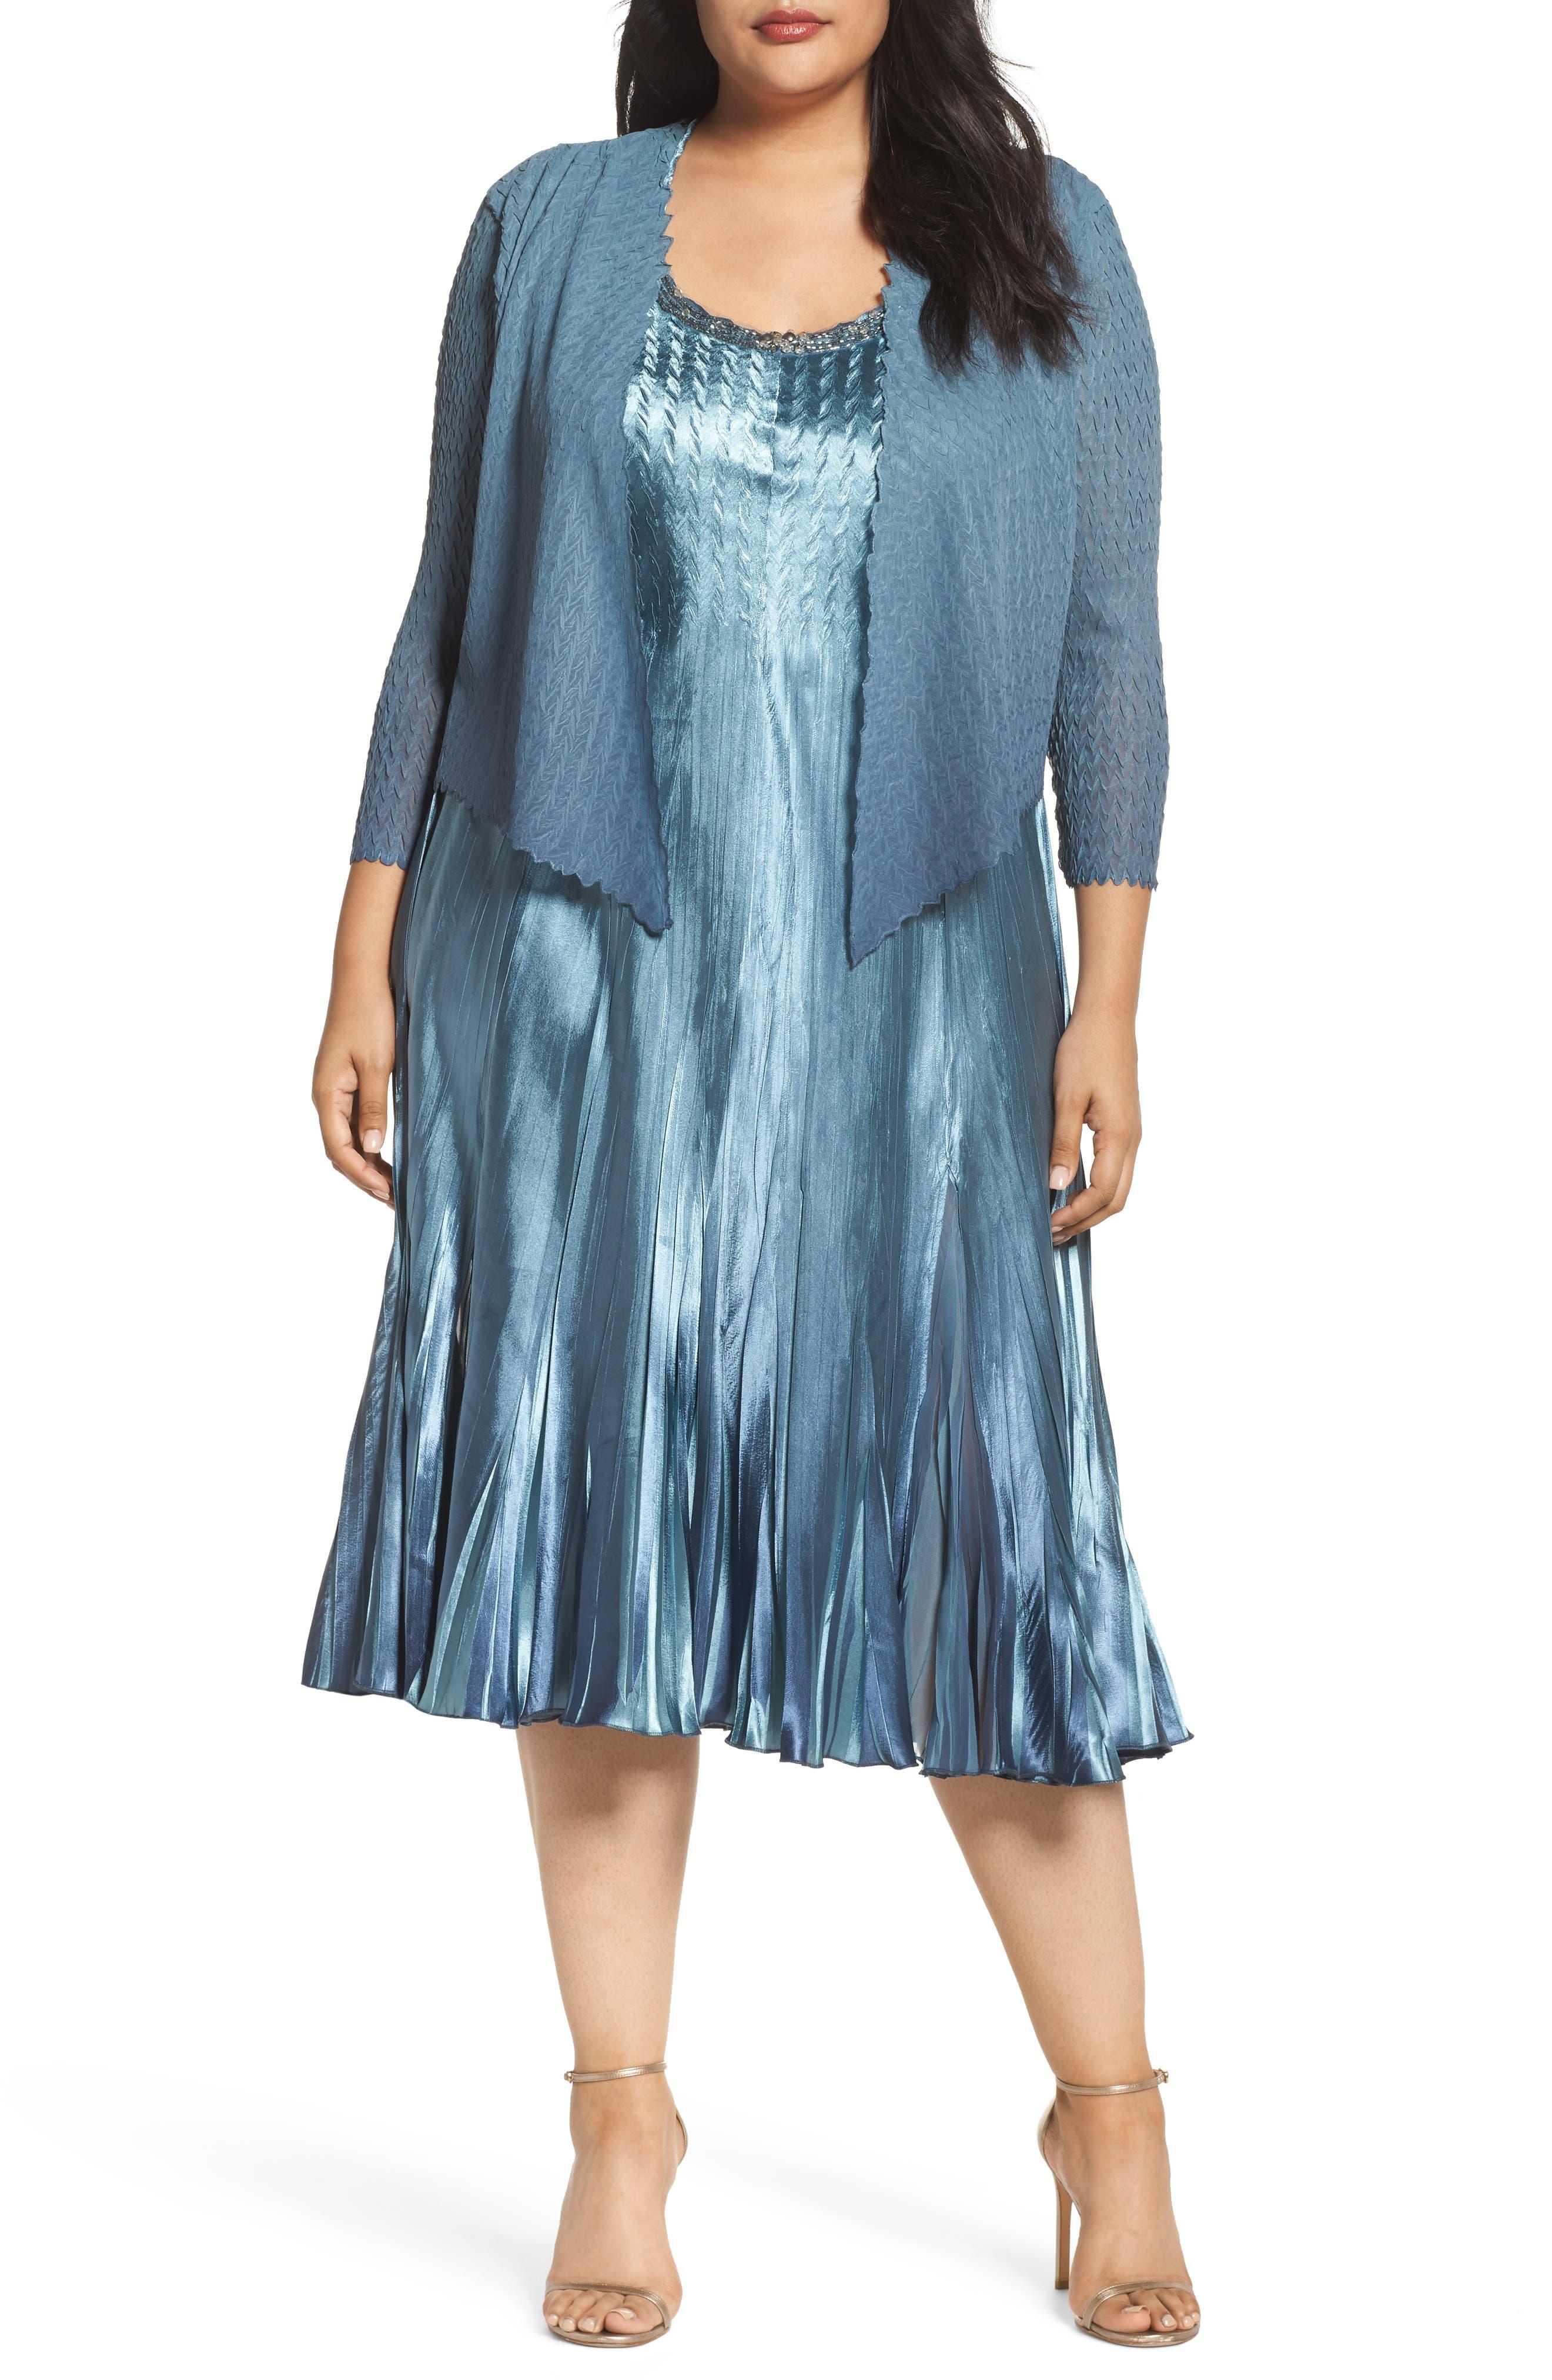 Embellished Charmeuse & Chiffon Dress with Jacket,                             Main thumbnail 1, color,                             460